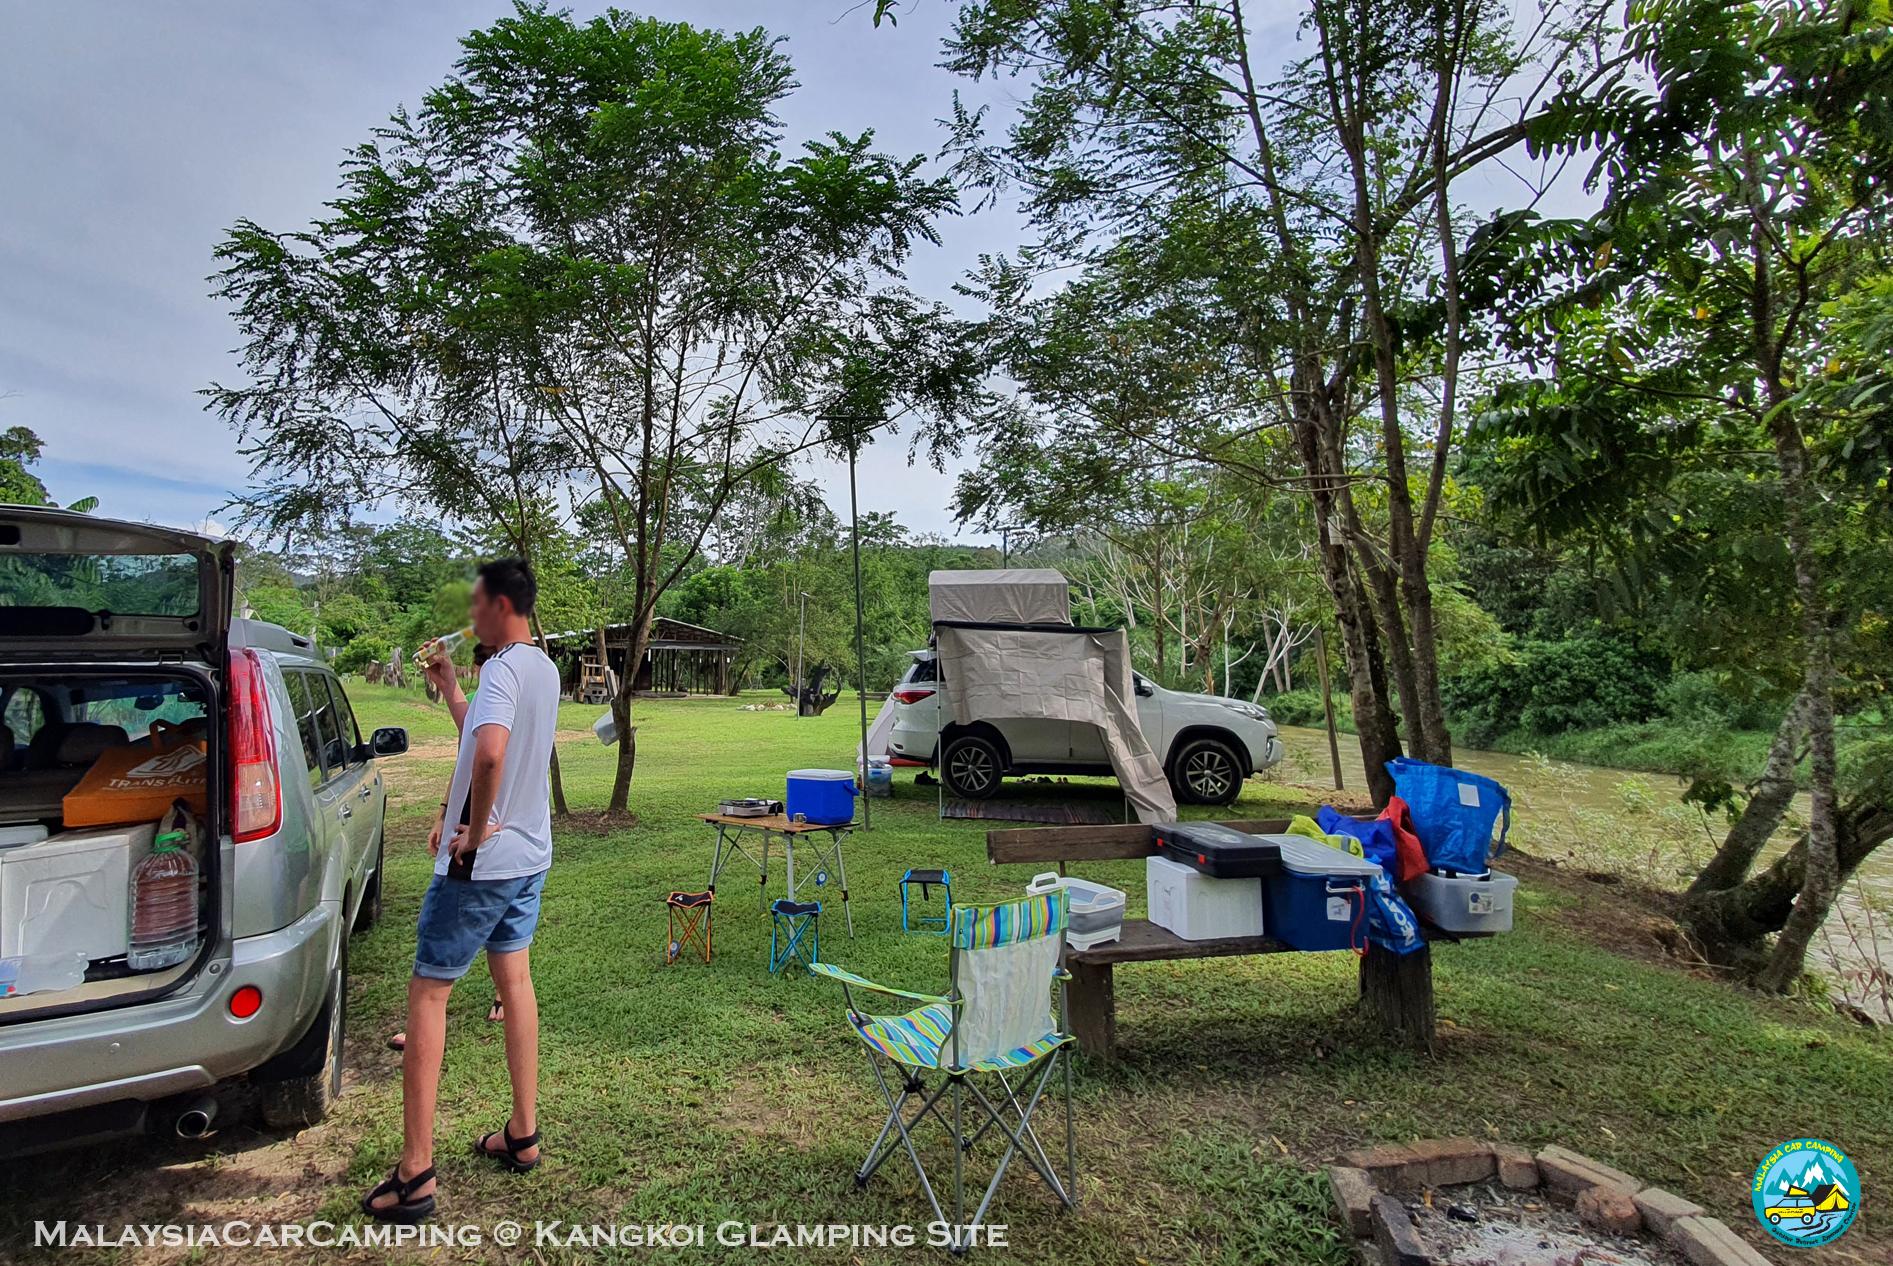 glamping_at_kangkoi_negeri_sembilan_camping_site_malaysia_car_camping_private_event_organizer-5